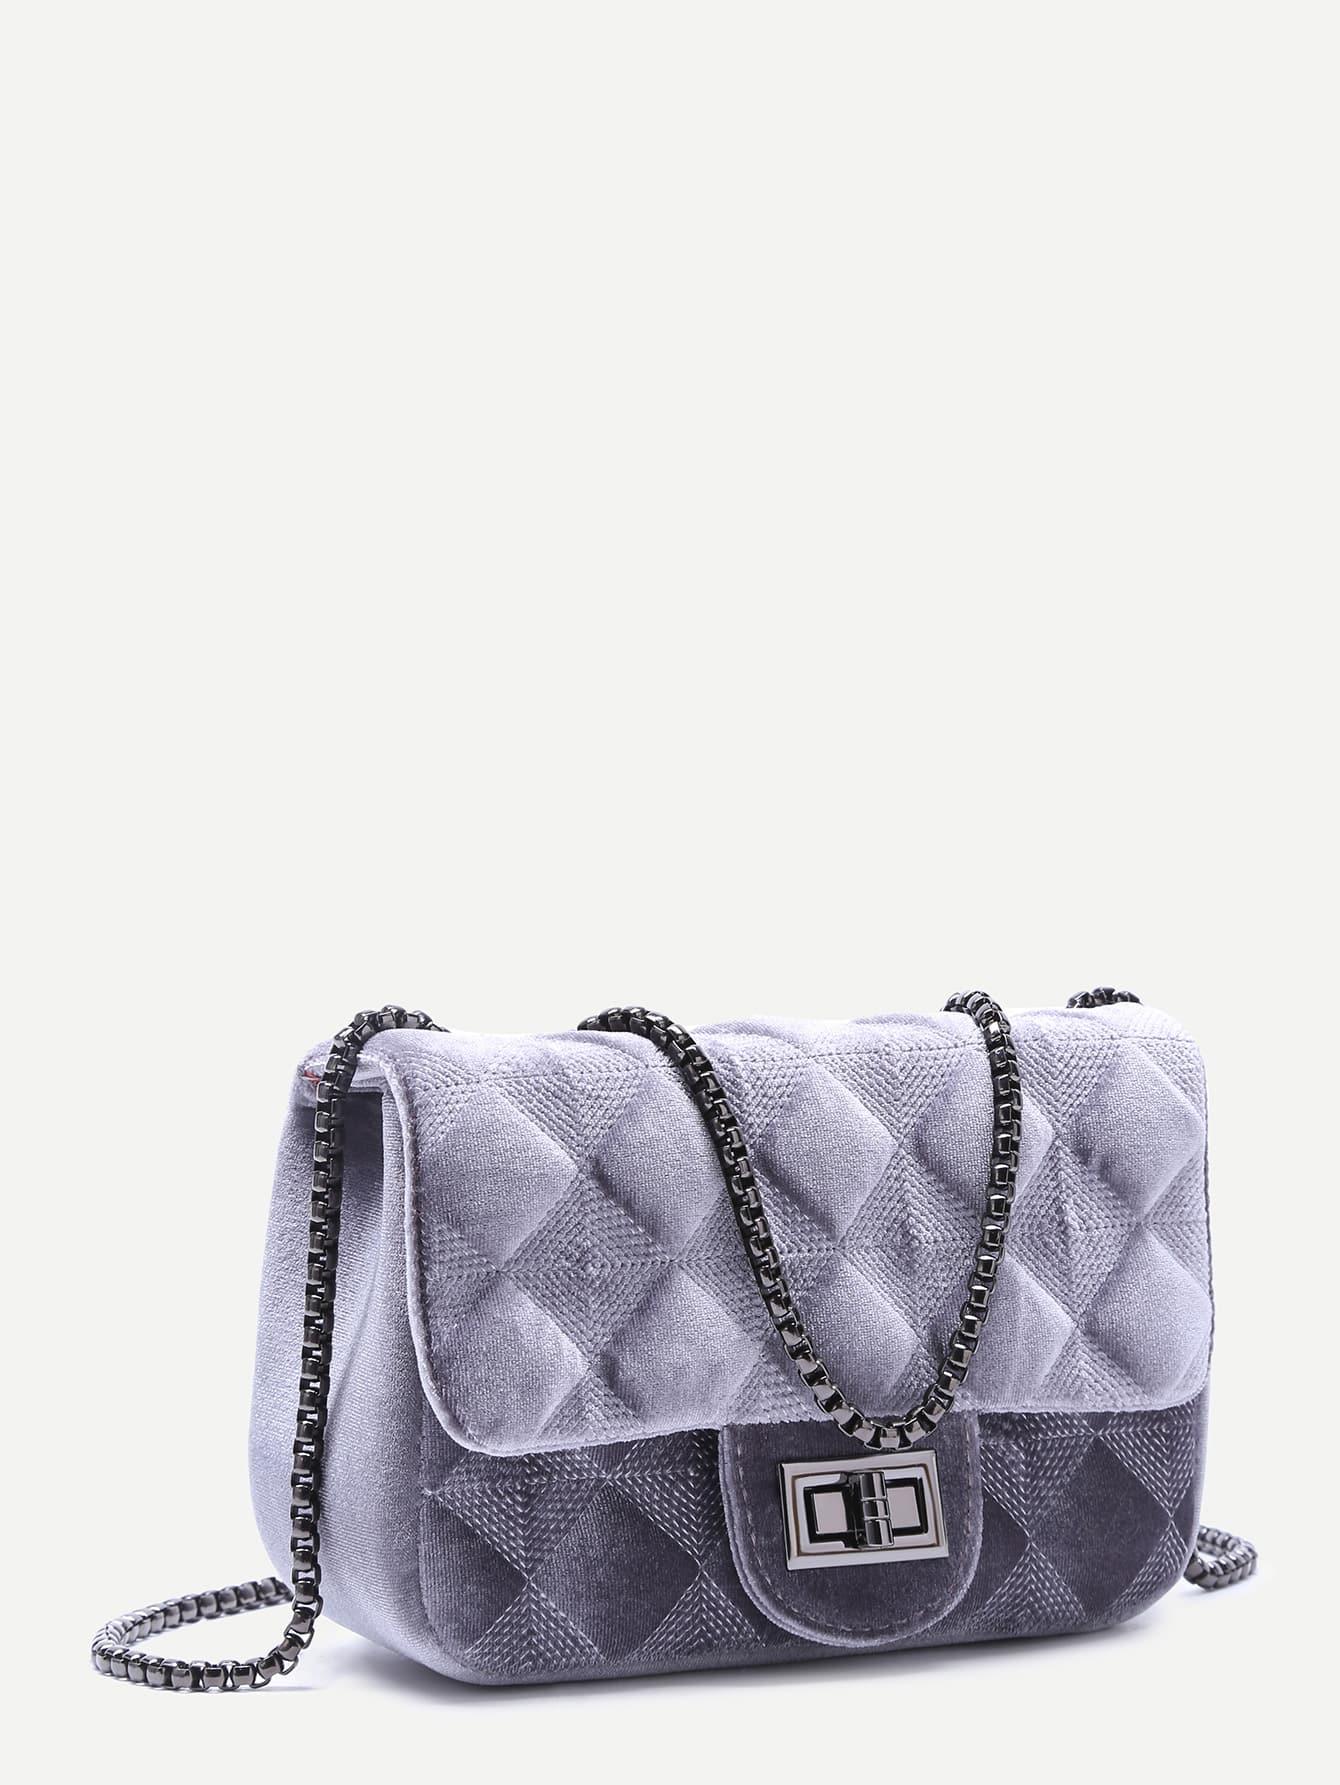 bag161109906_2